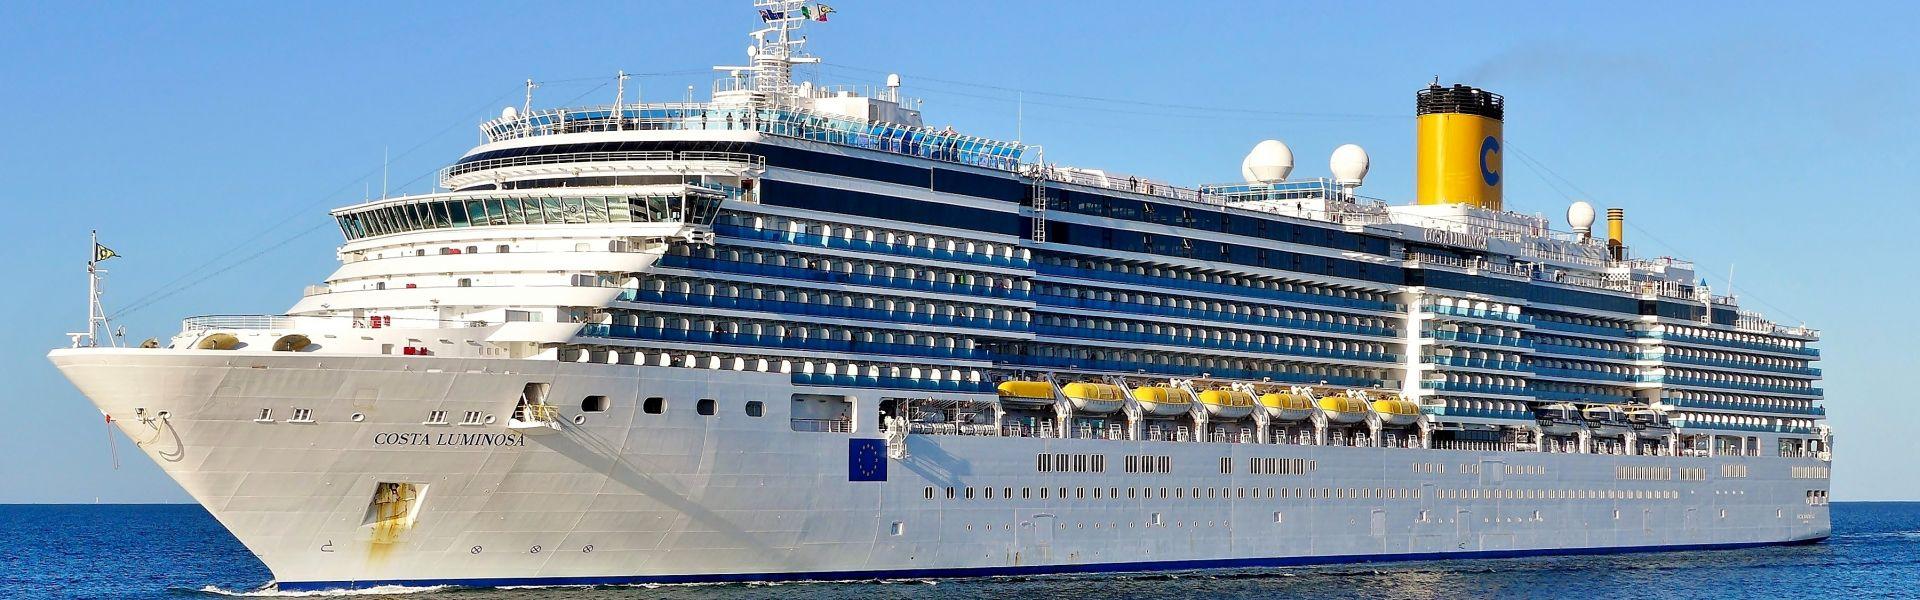 Croaziera 2018 - Mediterana de Est (Venetia) - Costa Cruises - Costa Luminosa - 7 nopti